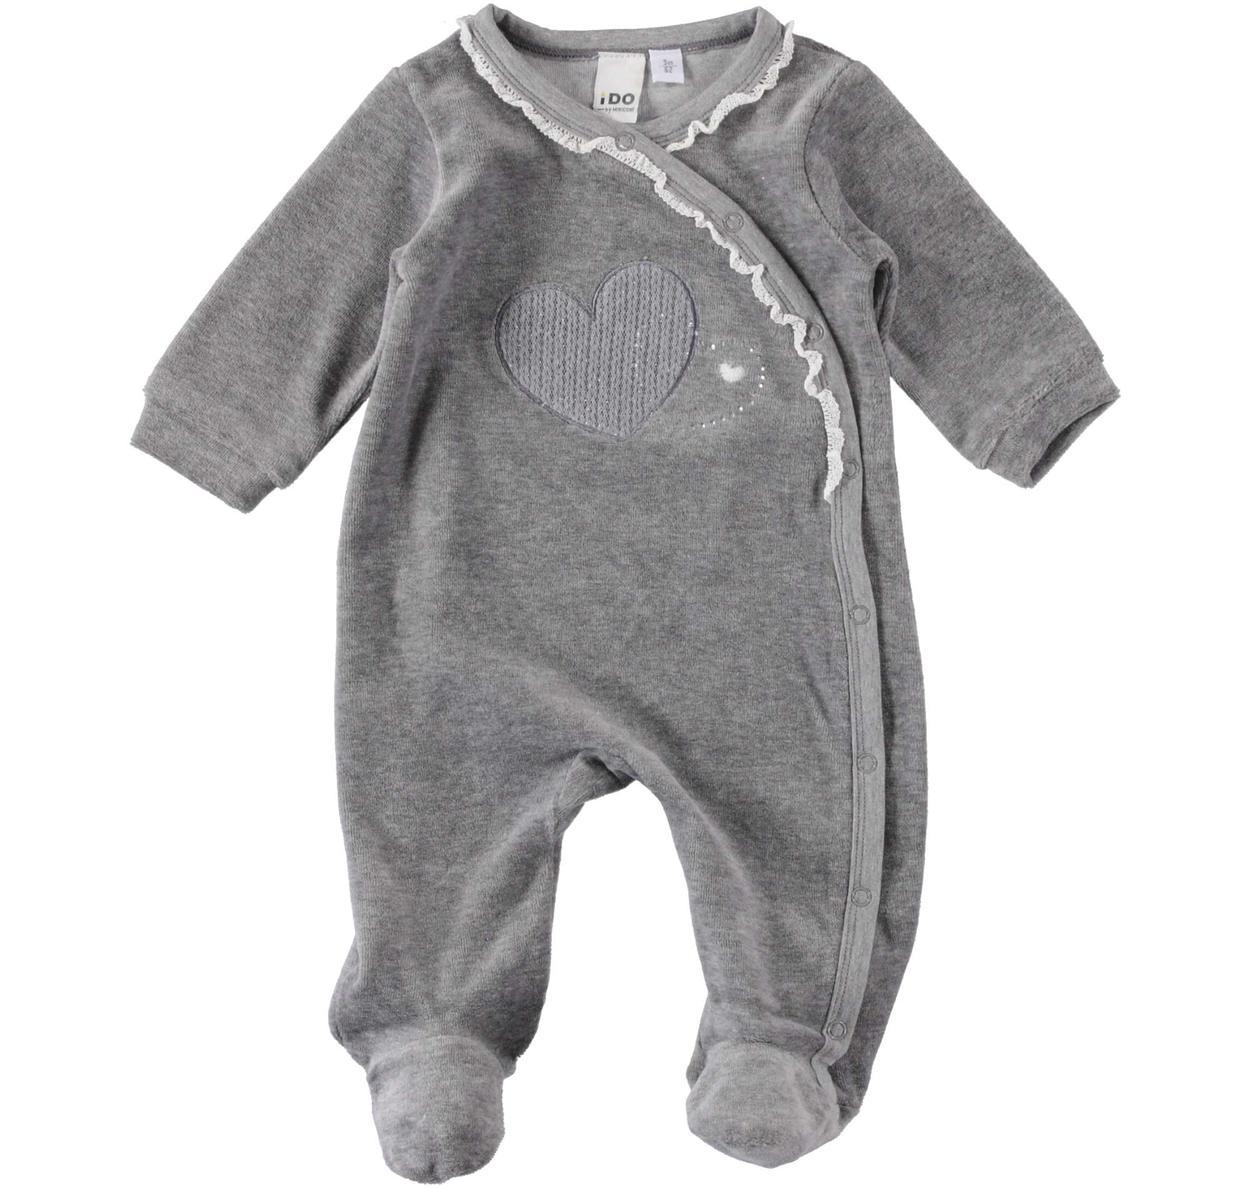 Tutina intera in ciniglia di cotone a maniche lunghe per neonata da ...